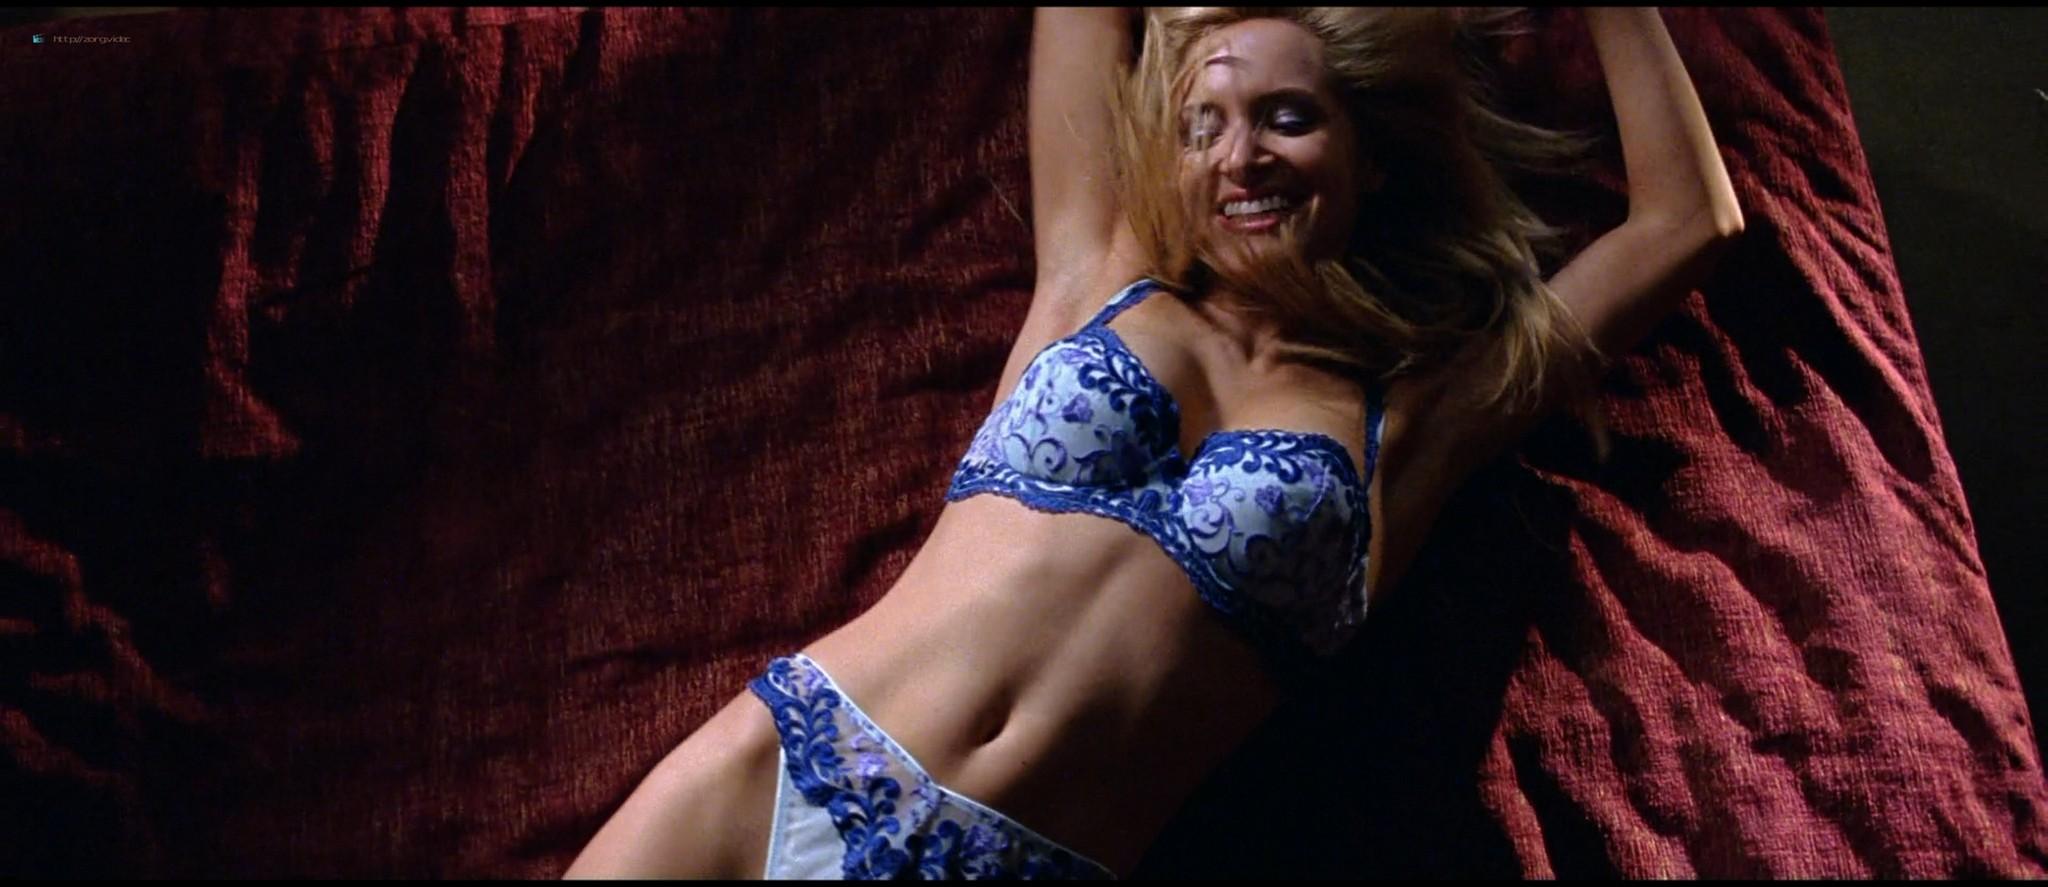 Diora Baird nude topless huge boobs others nude too - Wedding Crashers (2005) HD 1080p BluRay (16)